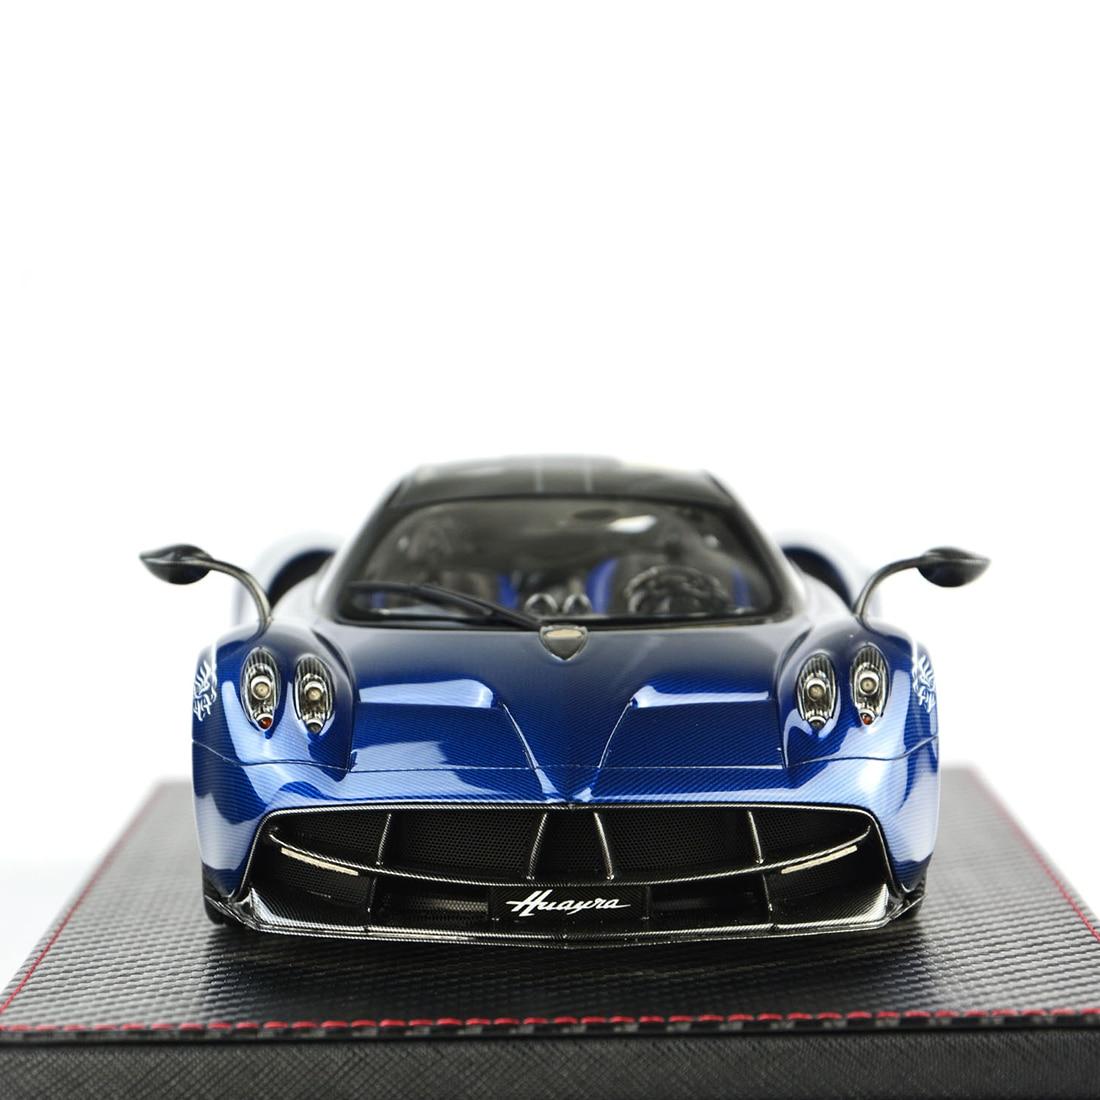 1:18 Auto Model Pagani Huayra Model Collection Decor Met Base Stofkap Model Educatief Speelgoed Blauw/Charcoal Grey /Paars Rood